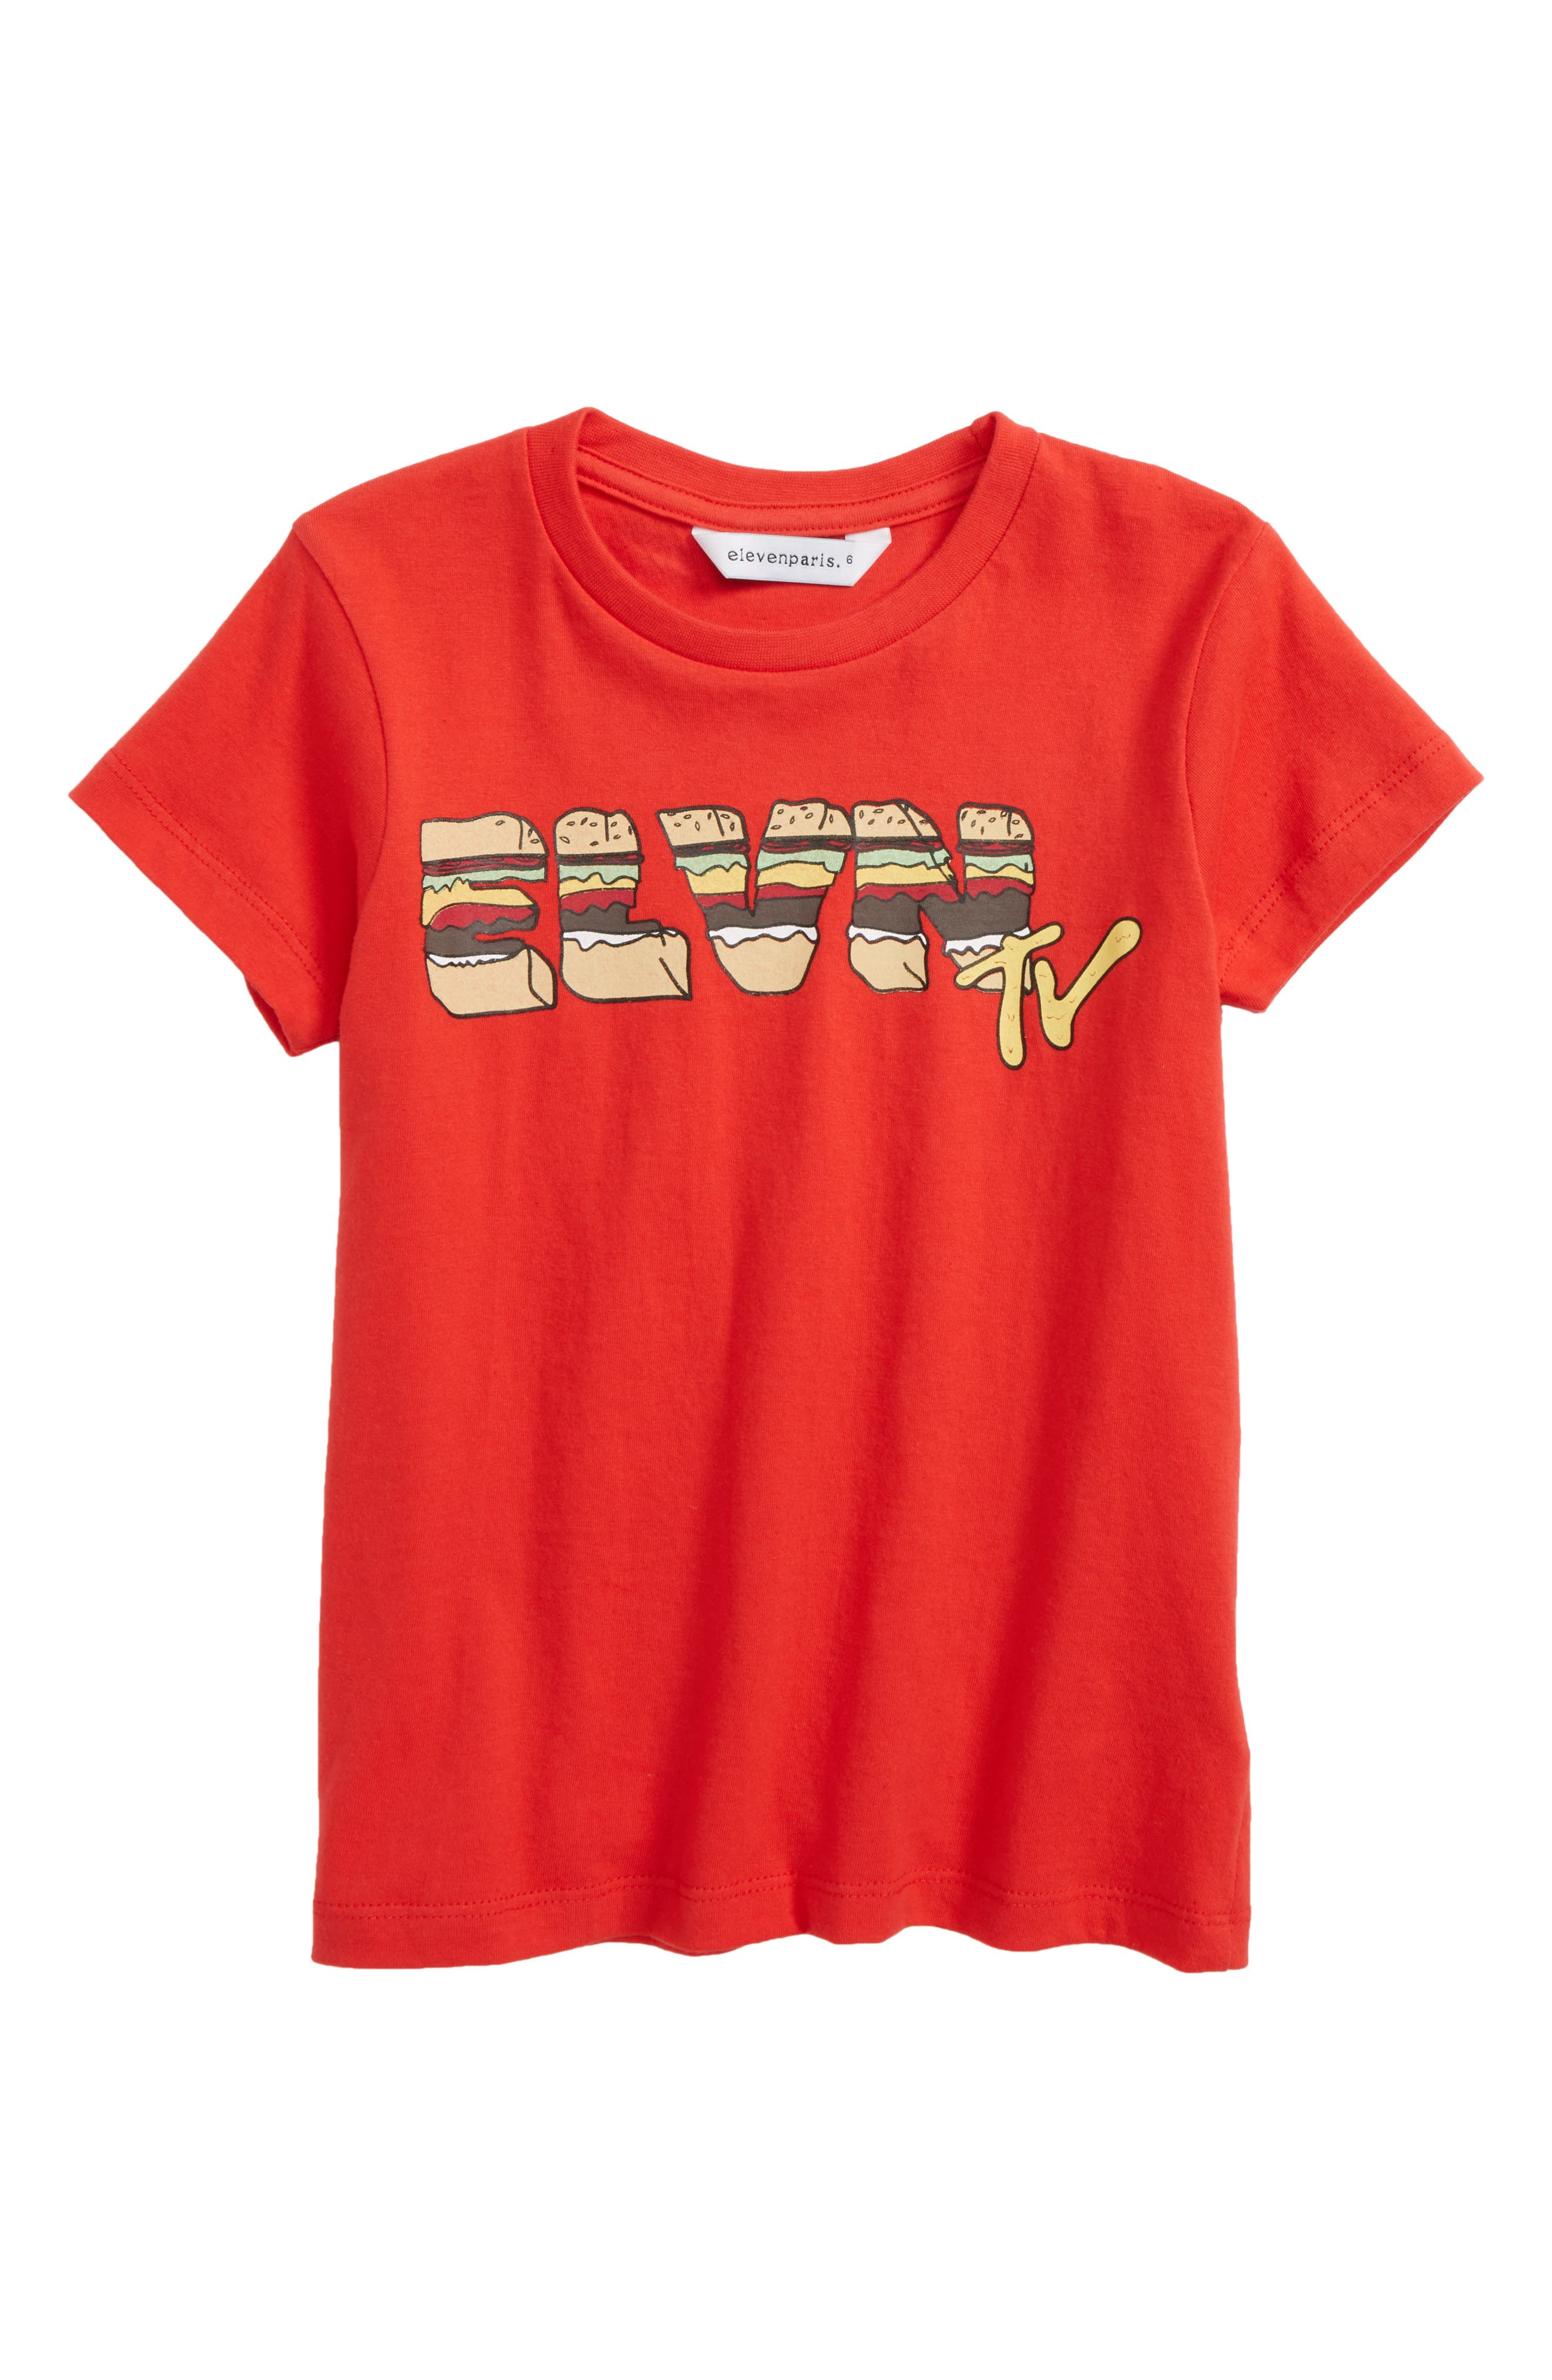 Little ELEVENPARIS HTV T-Shirt,                             Main thumbnail 1, color,                             Red